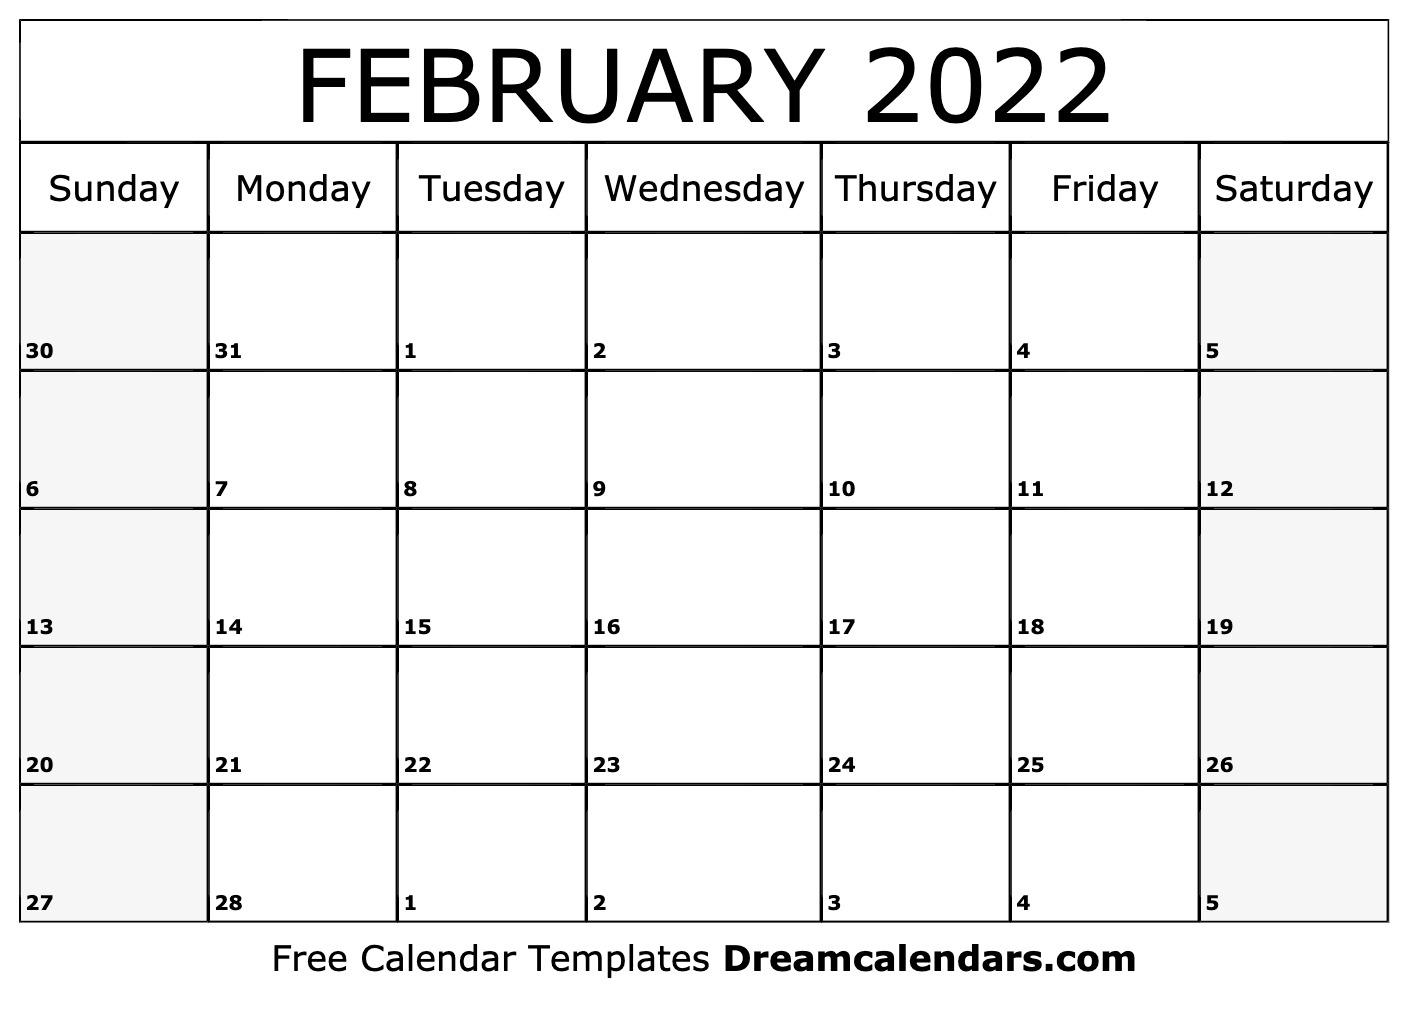 February 2022 Calendar | Free Blank Printable Templates With Calendar 2022 February Floral